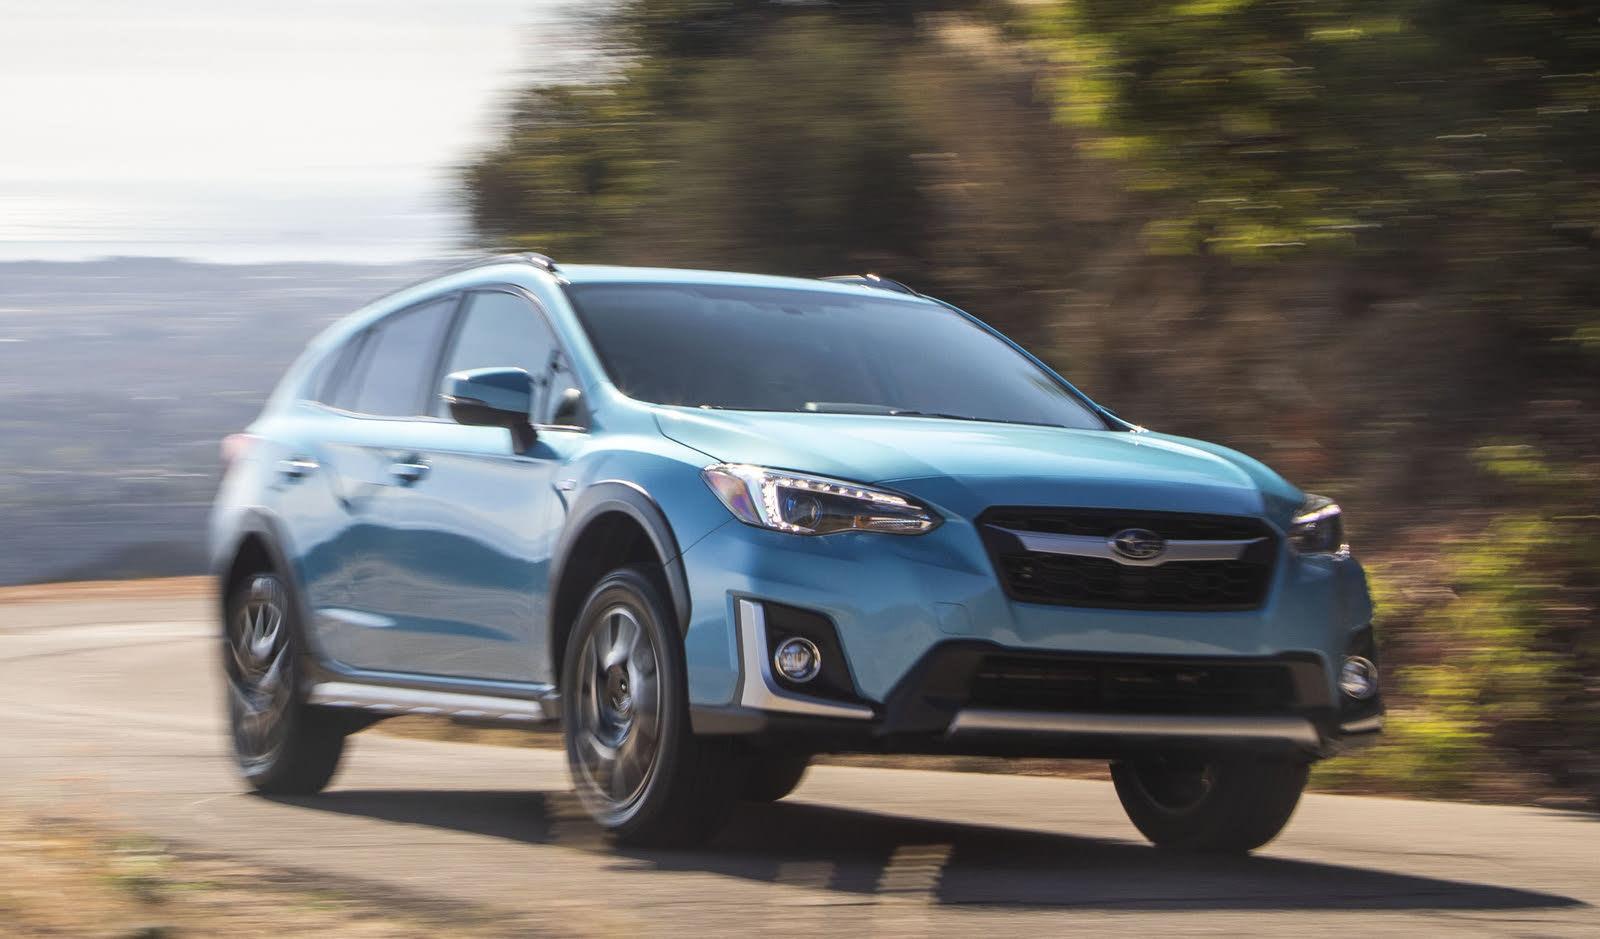 New Motors Subaru Erie Pa >> 2020 Subaru Crosstrek Hybrid for Sale in Erie, PA - CarGurus